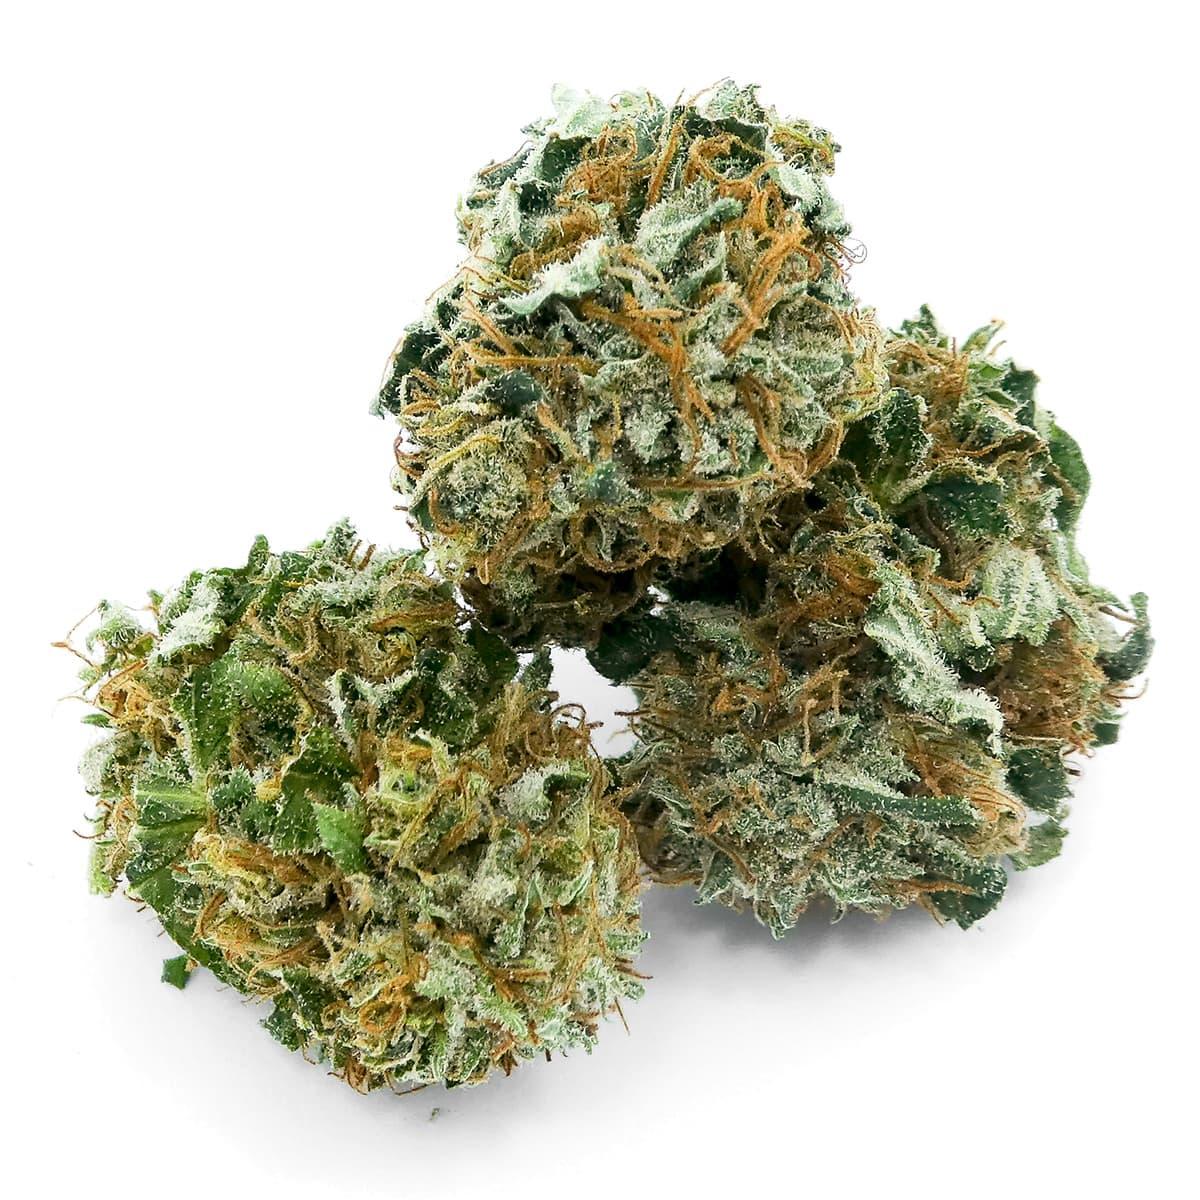 grossiste cbd suisse vente cannabis l gal prix achat weed en gros. Black Bedroom Furniture Sets. Home Design Ideas